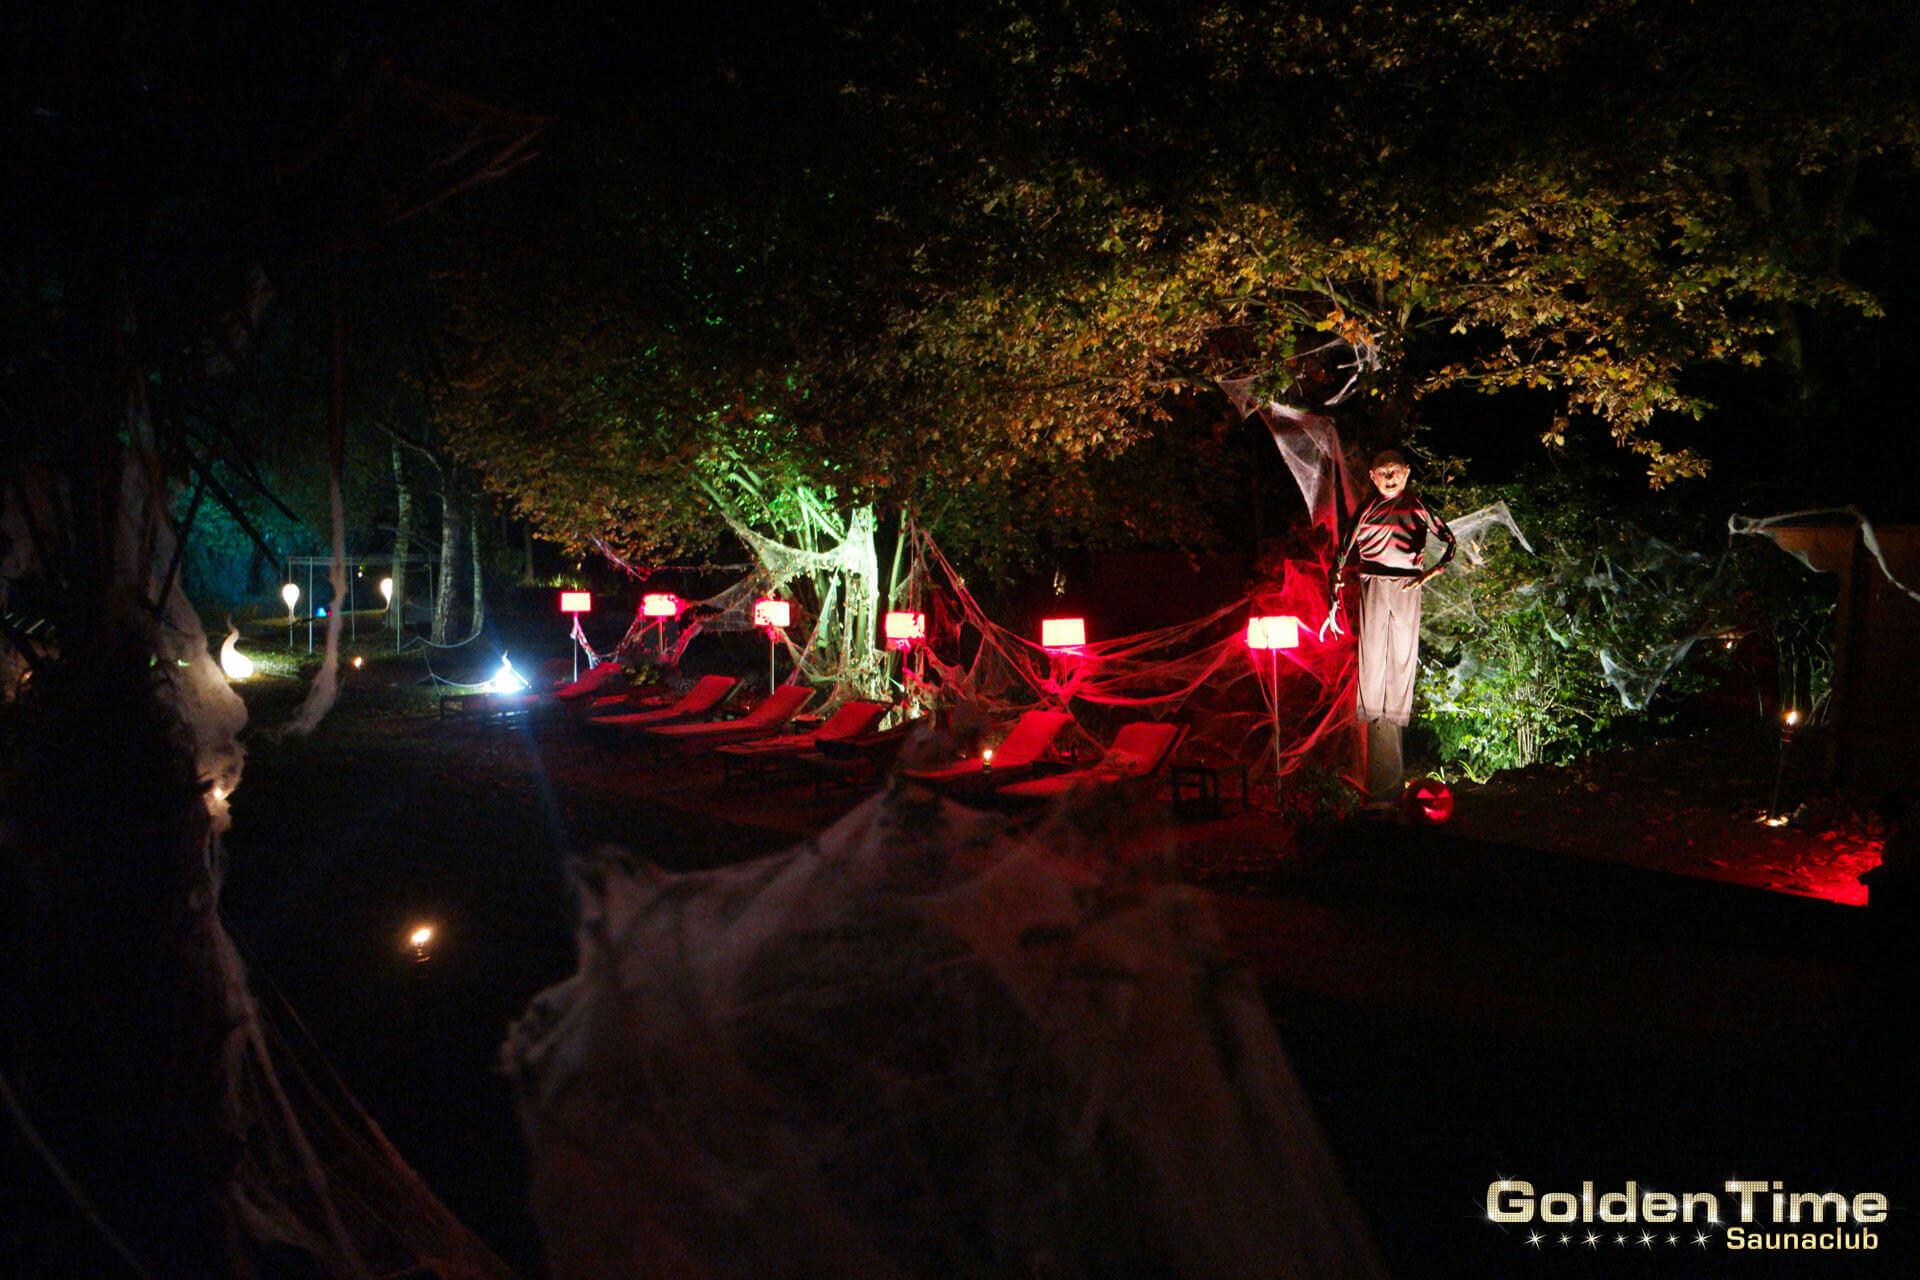 03-halloween-2016-goldentime-saunaclub-34.jpg